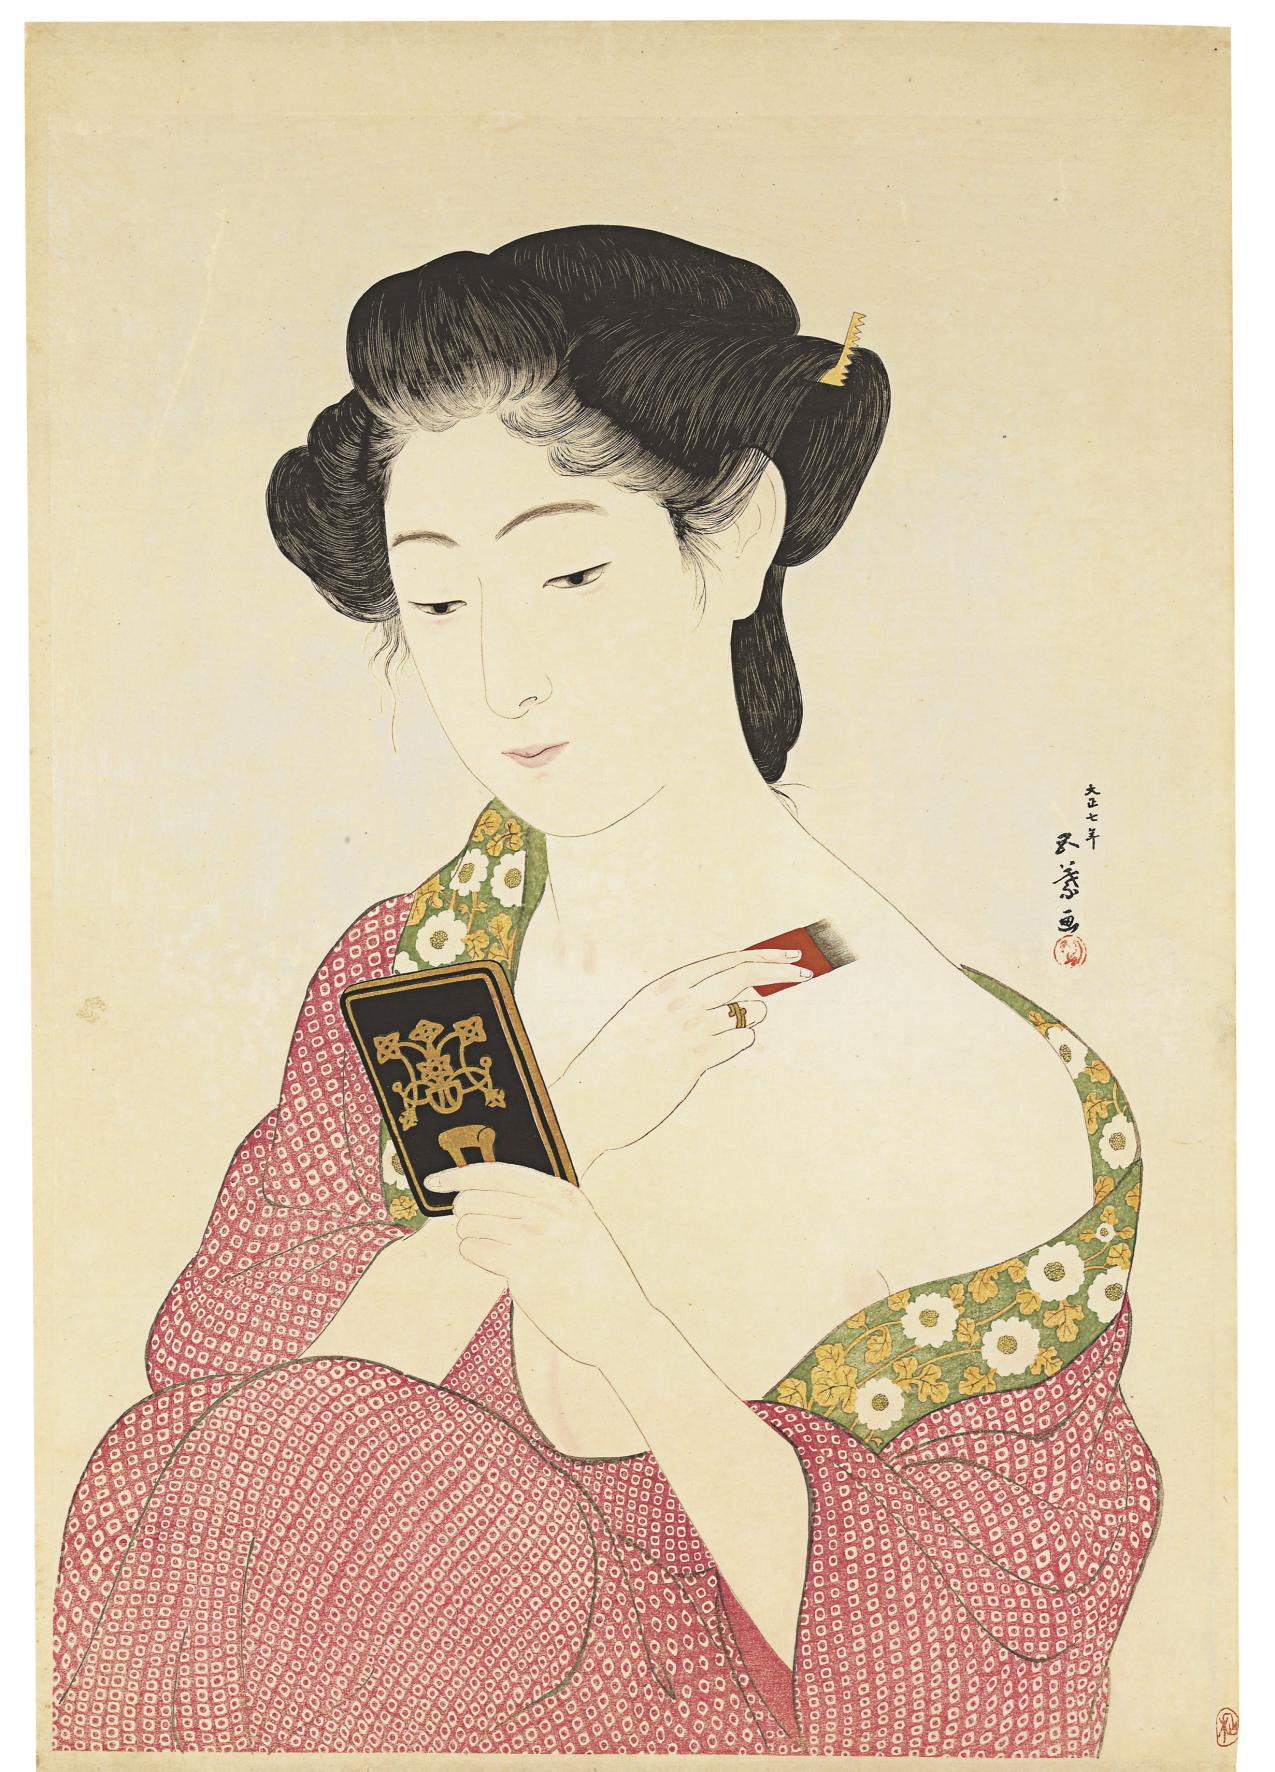 Kesho no onna (Woman applying make-up), 1918